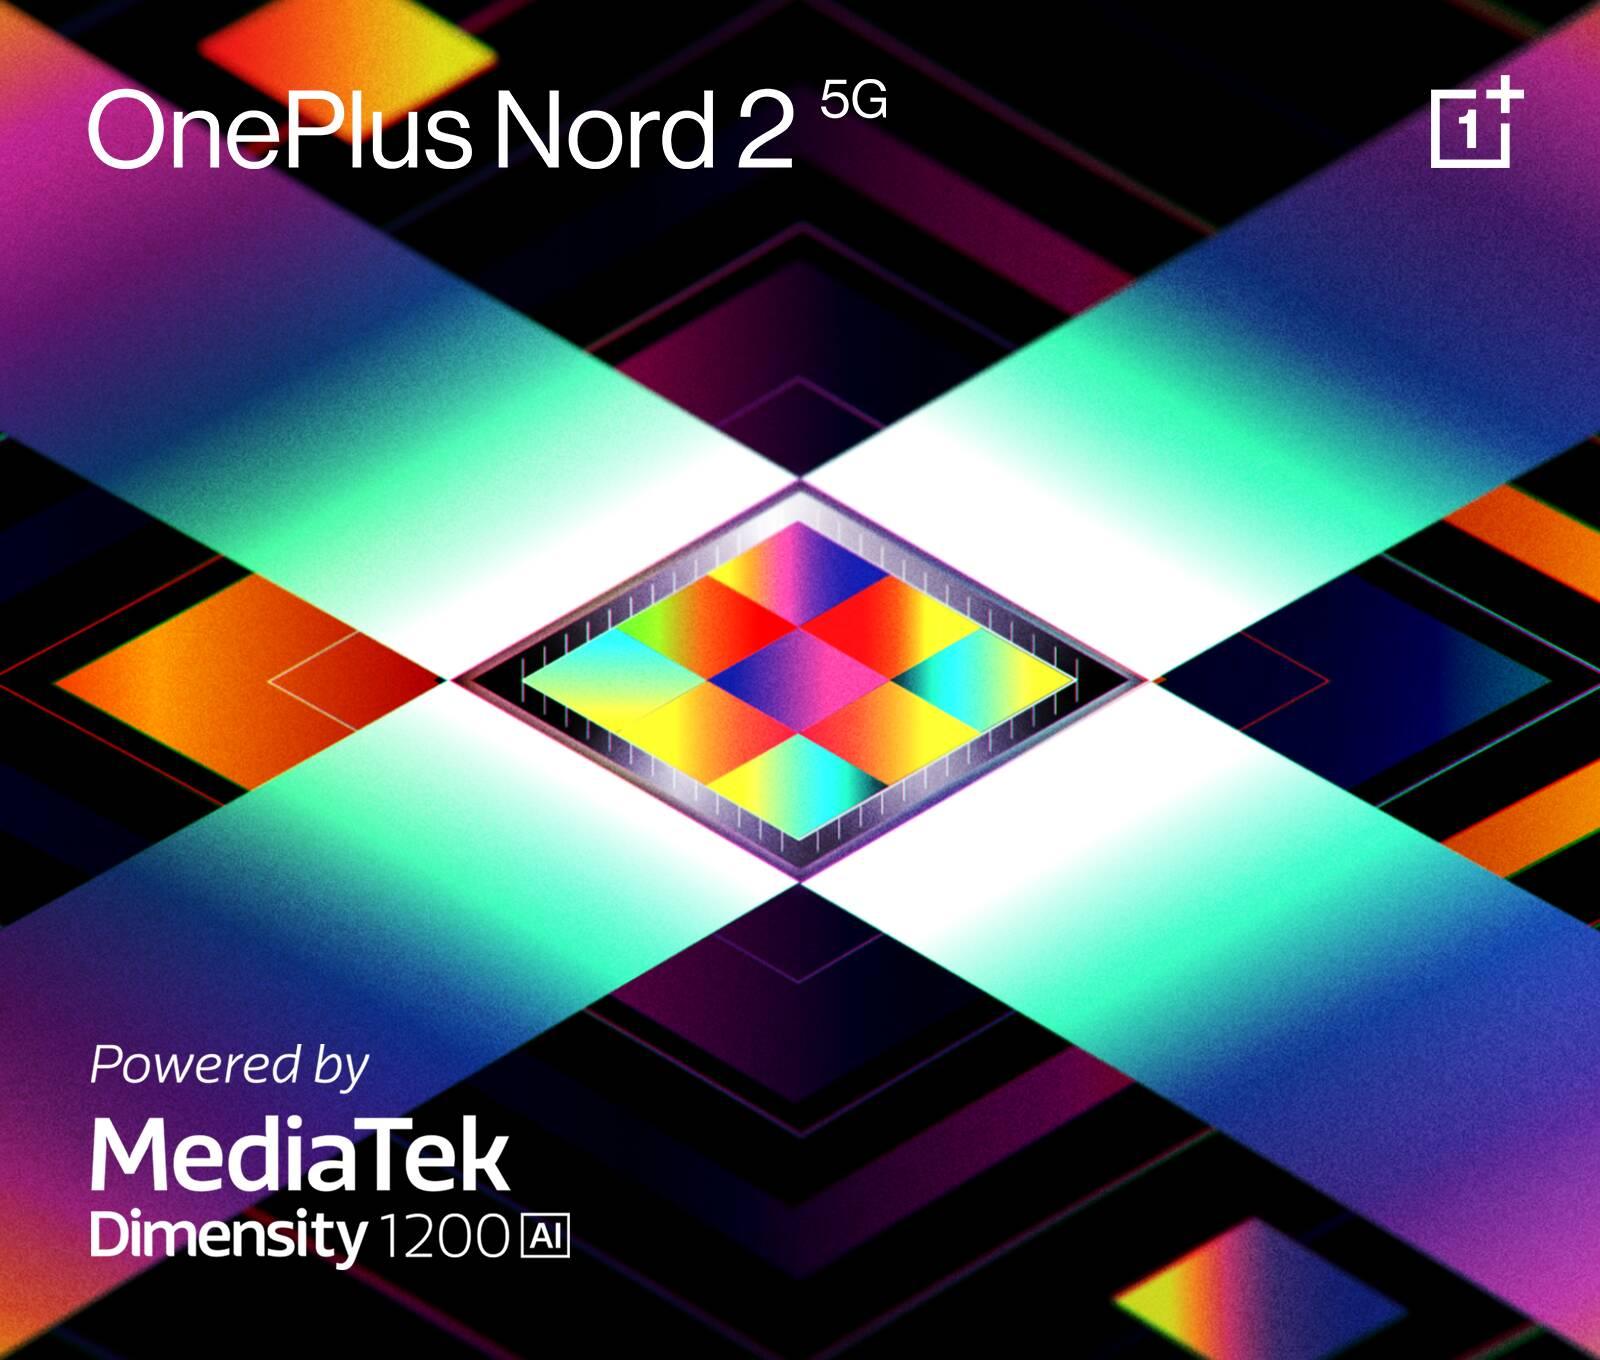 OnePlus e MediaTek 1200-AI | Nord 2 5G